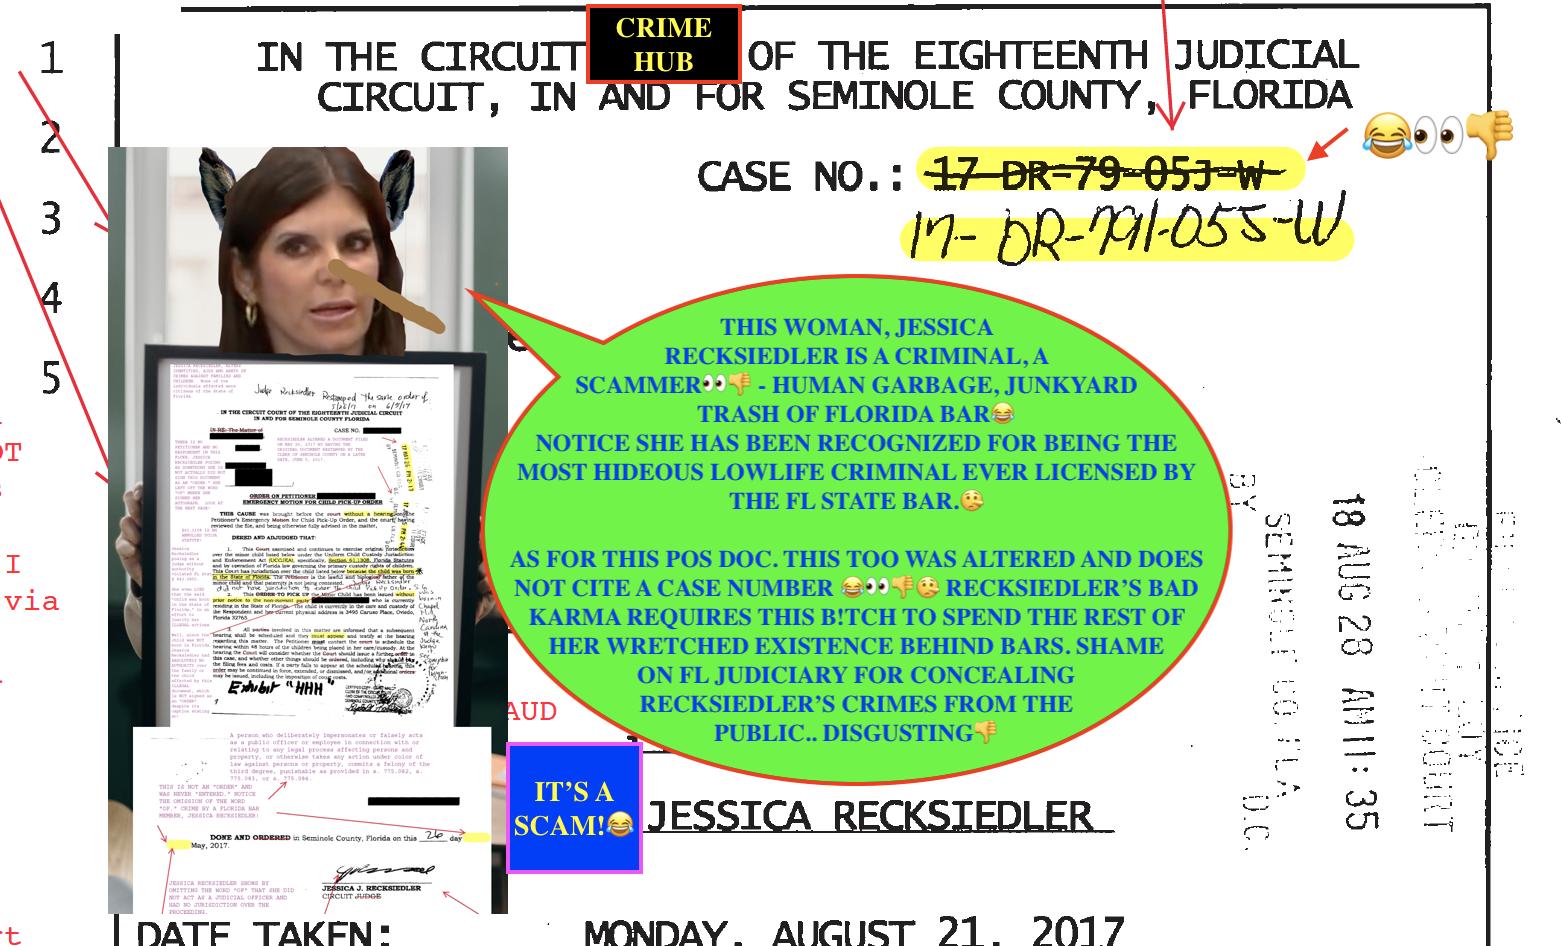 Jessica Recksiedler, JUDGE IN Seminole County Florida of the 18th judicial circuit court in Seminole County, Florida EXPOSED